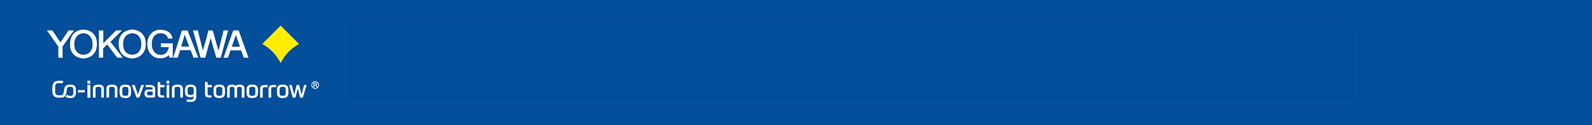 Yokogawa blue header 9.9.20 - 3